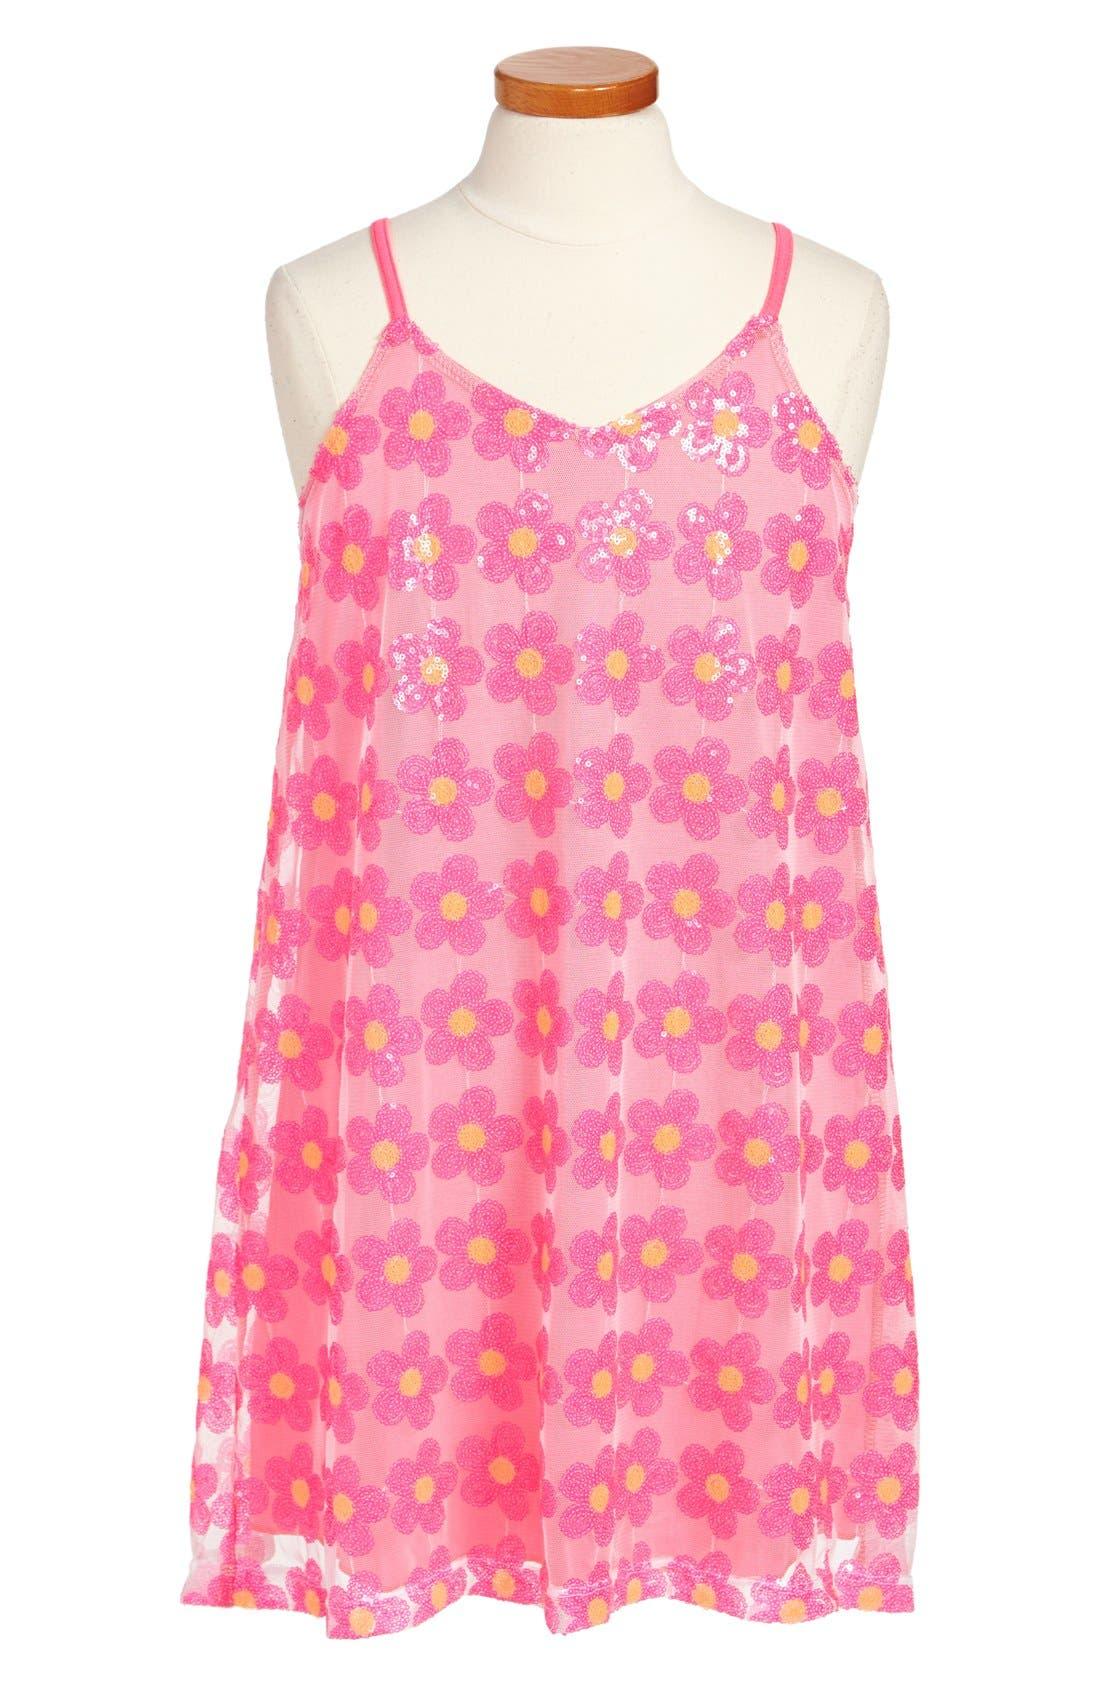 Alternate Image 1 Selected - Flowers by Zoe 'Daisy' Mesh Dress (Big Girls)